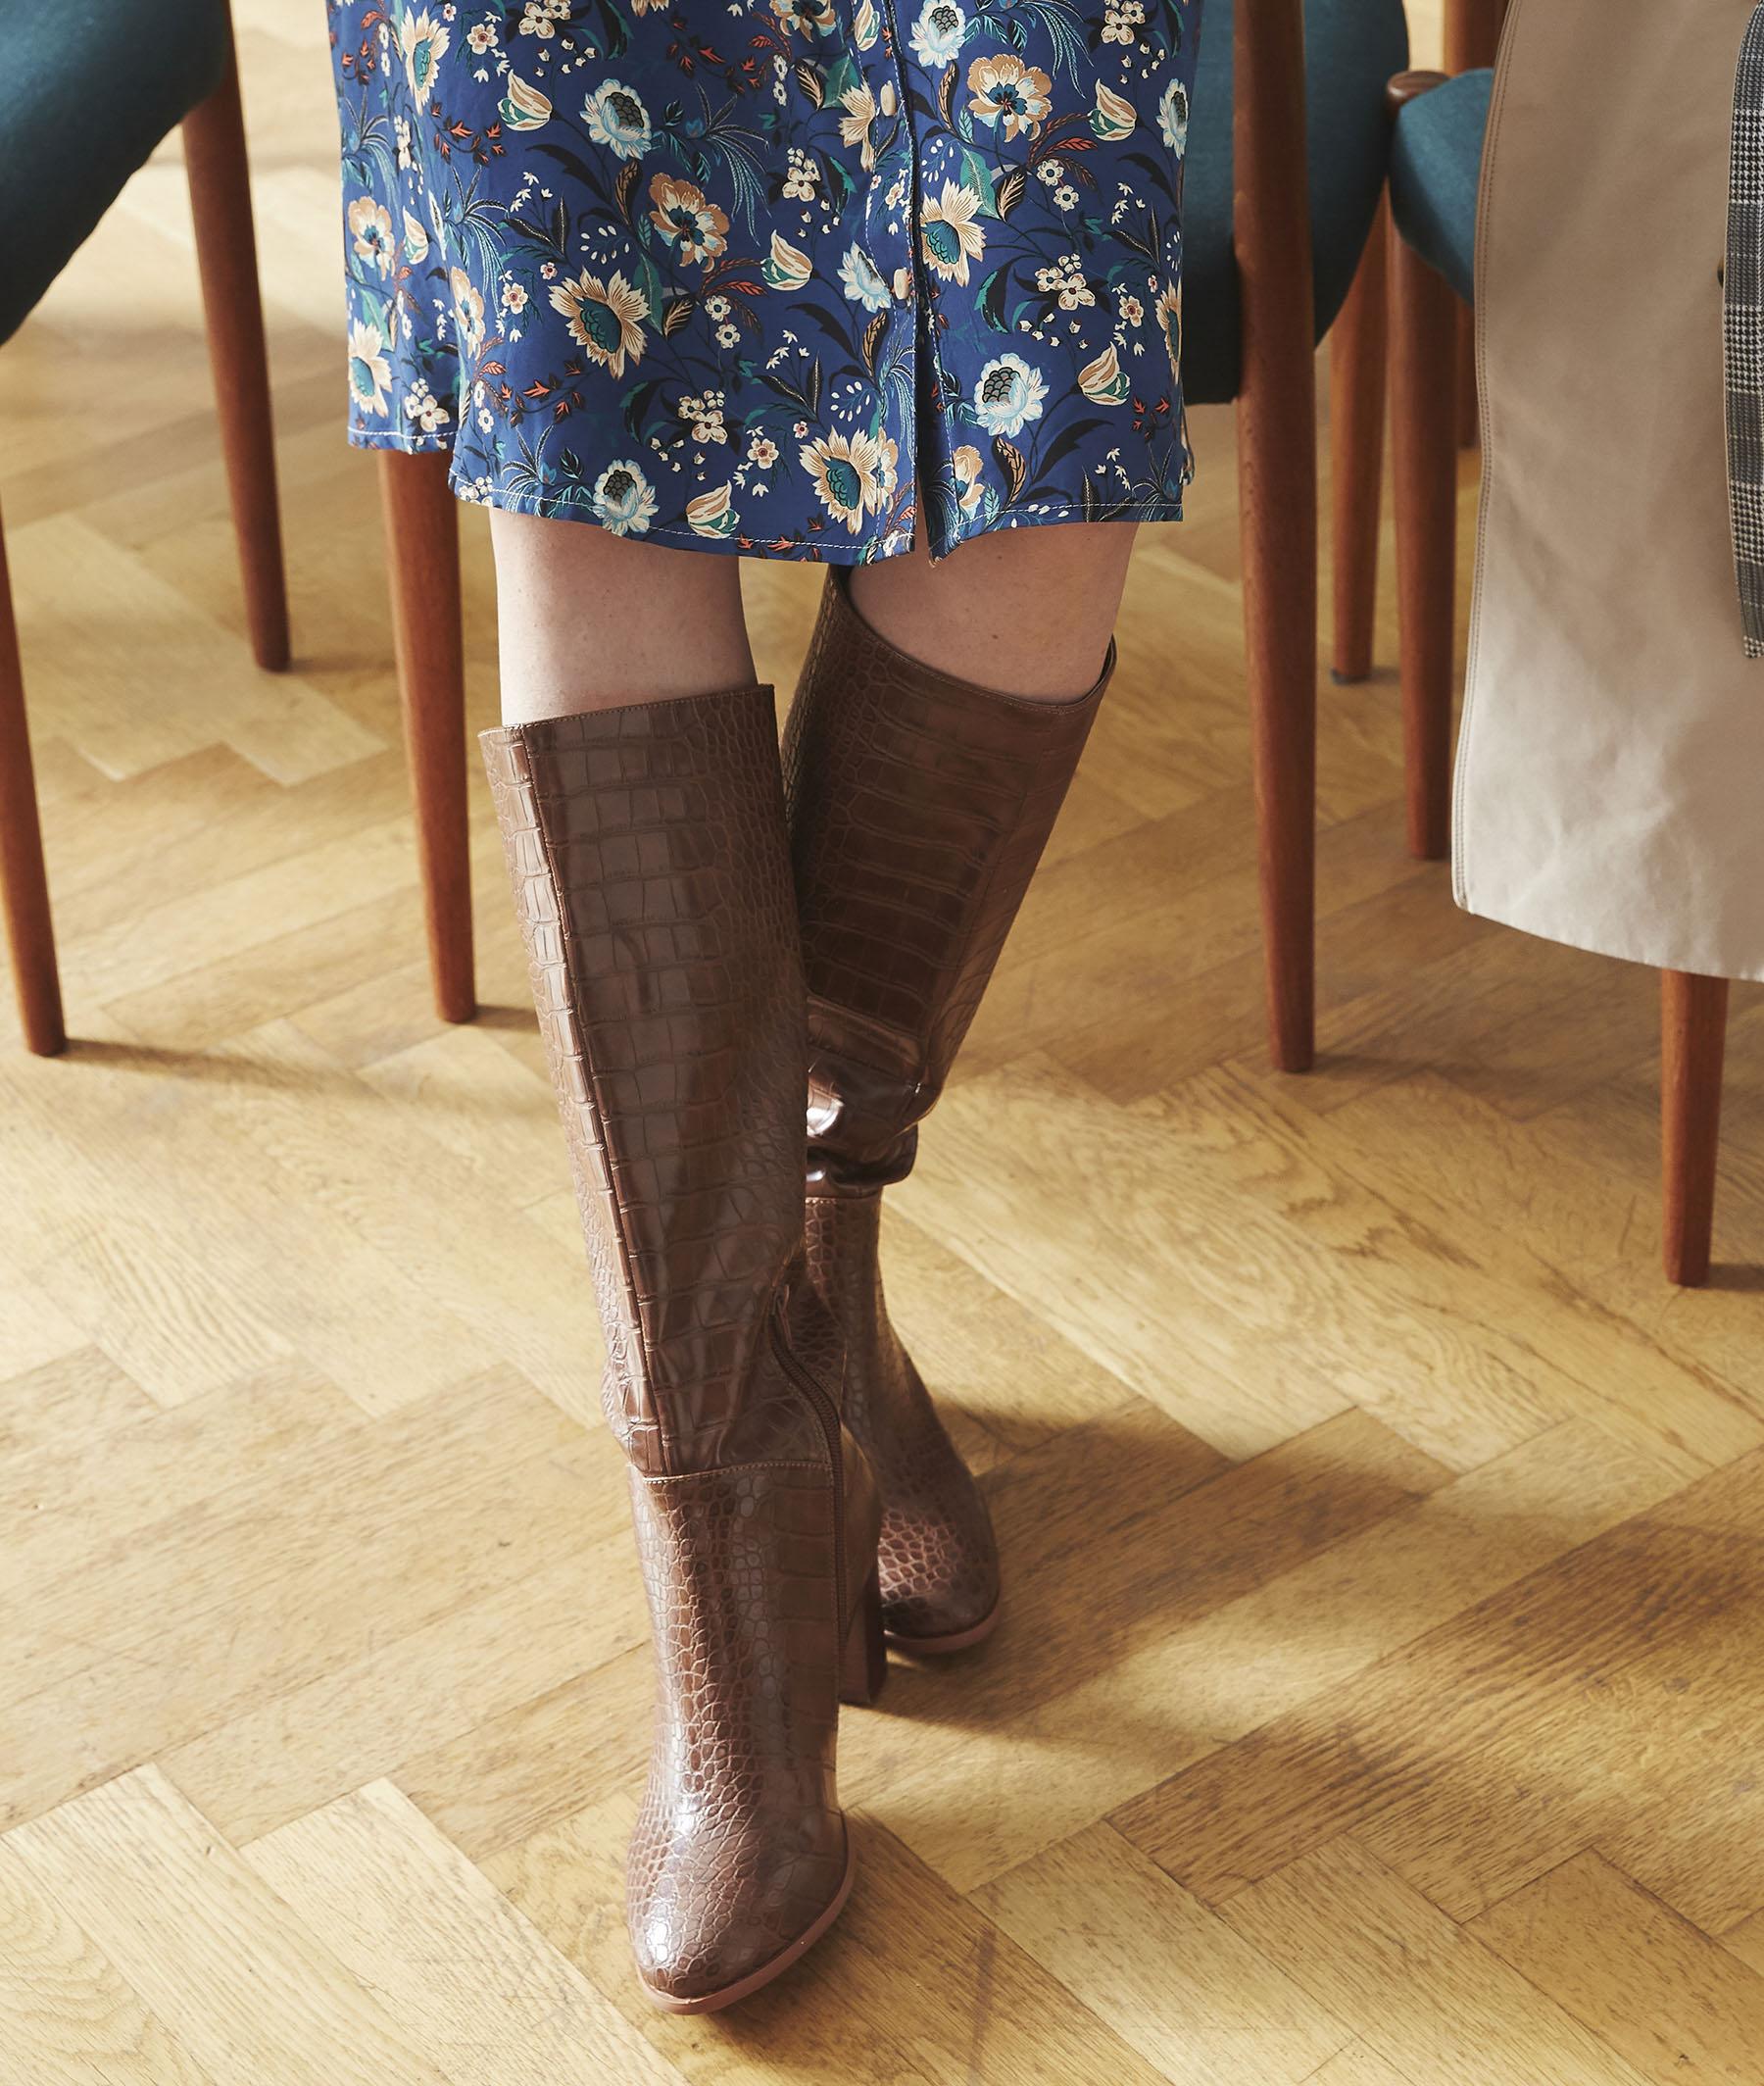 Bottes mi-hautes marroneffet croco femme CAMEL